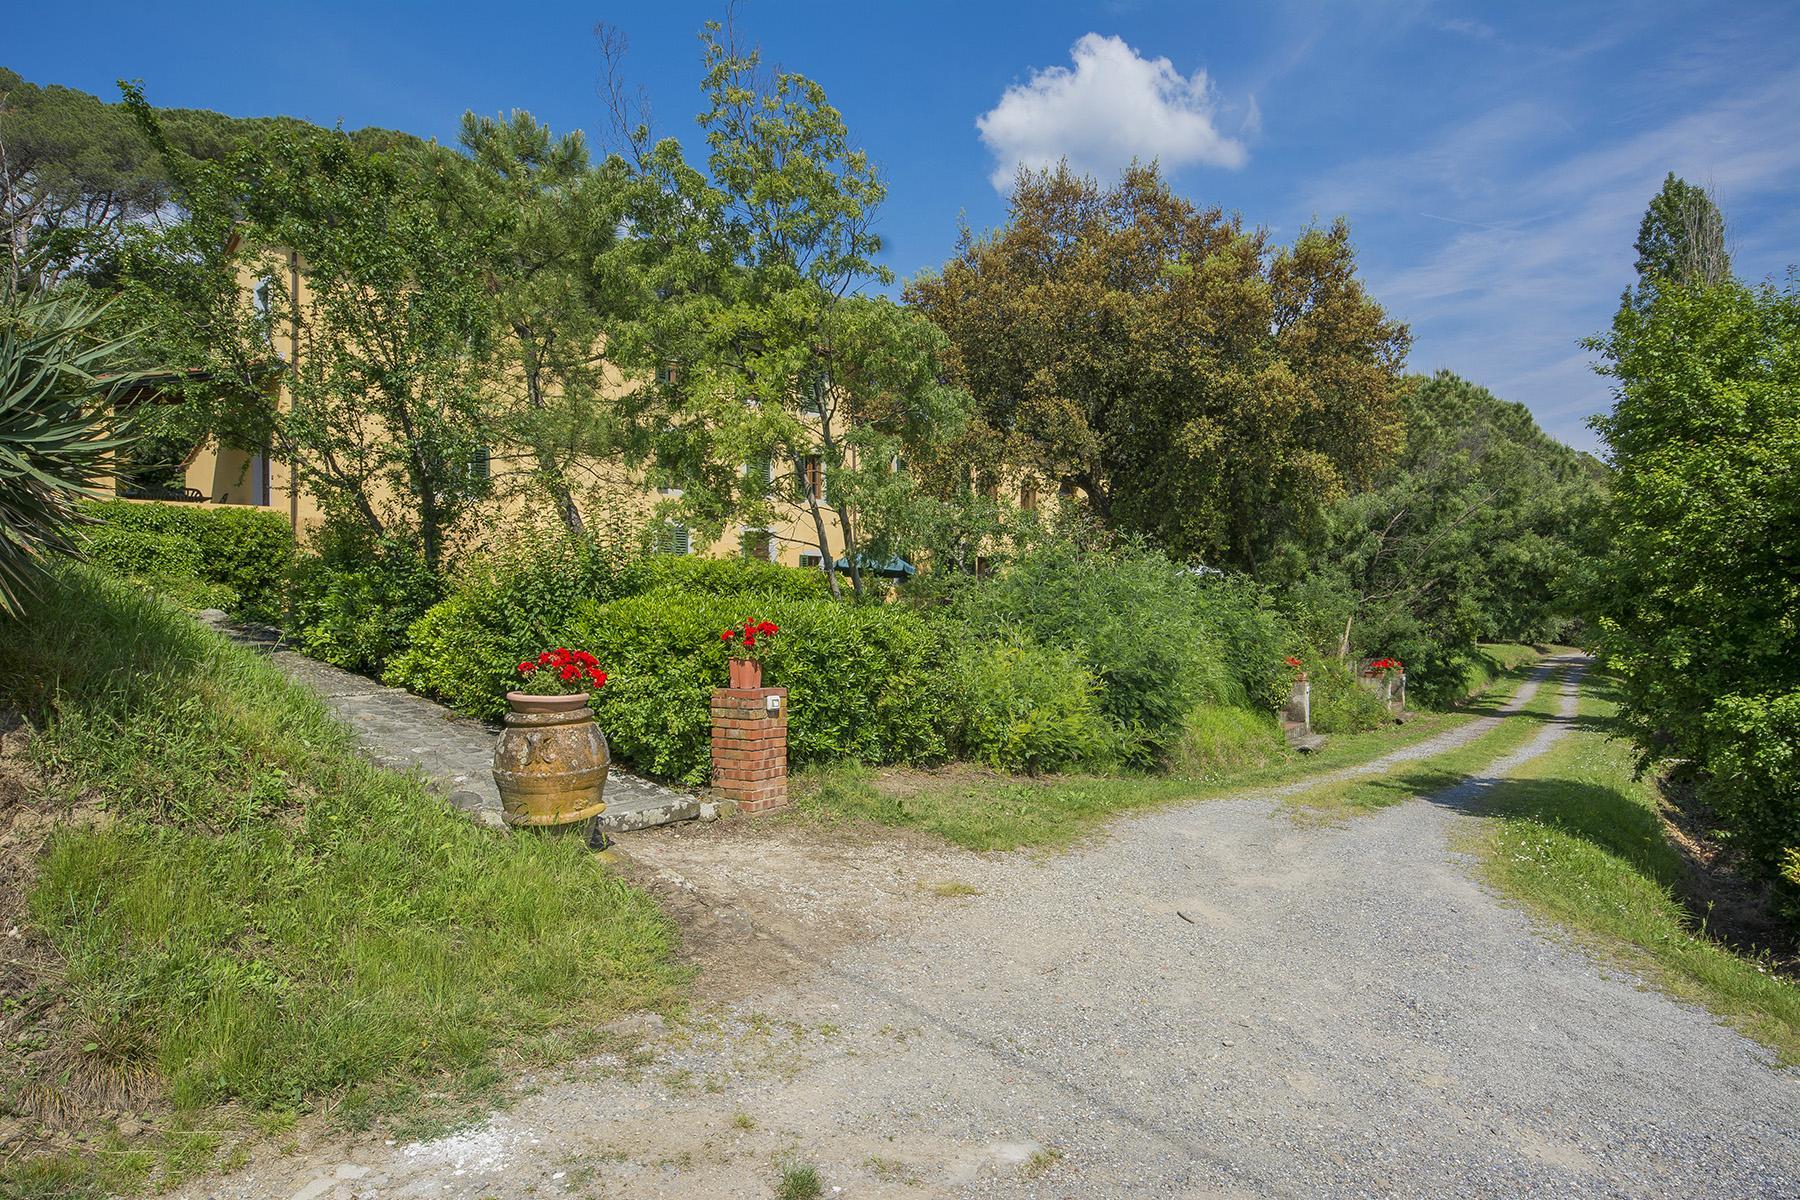 Pescia小山丘上美丽的乡间农舍 - 33